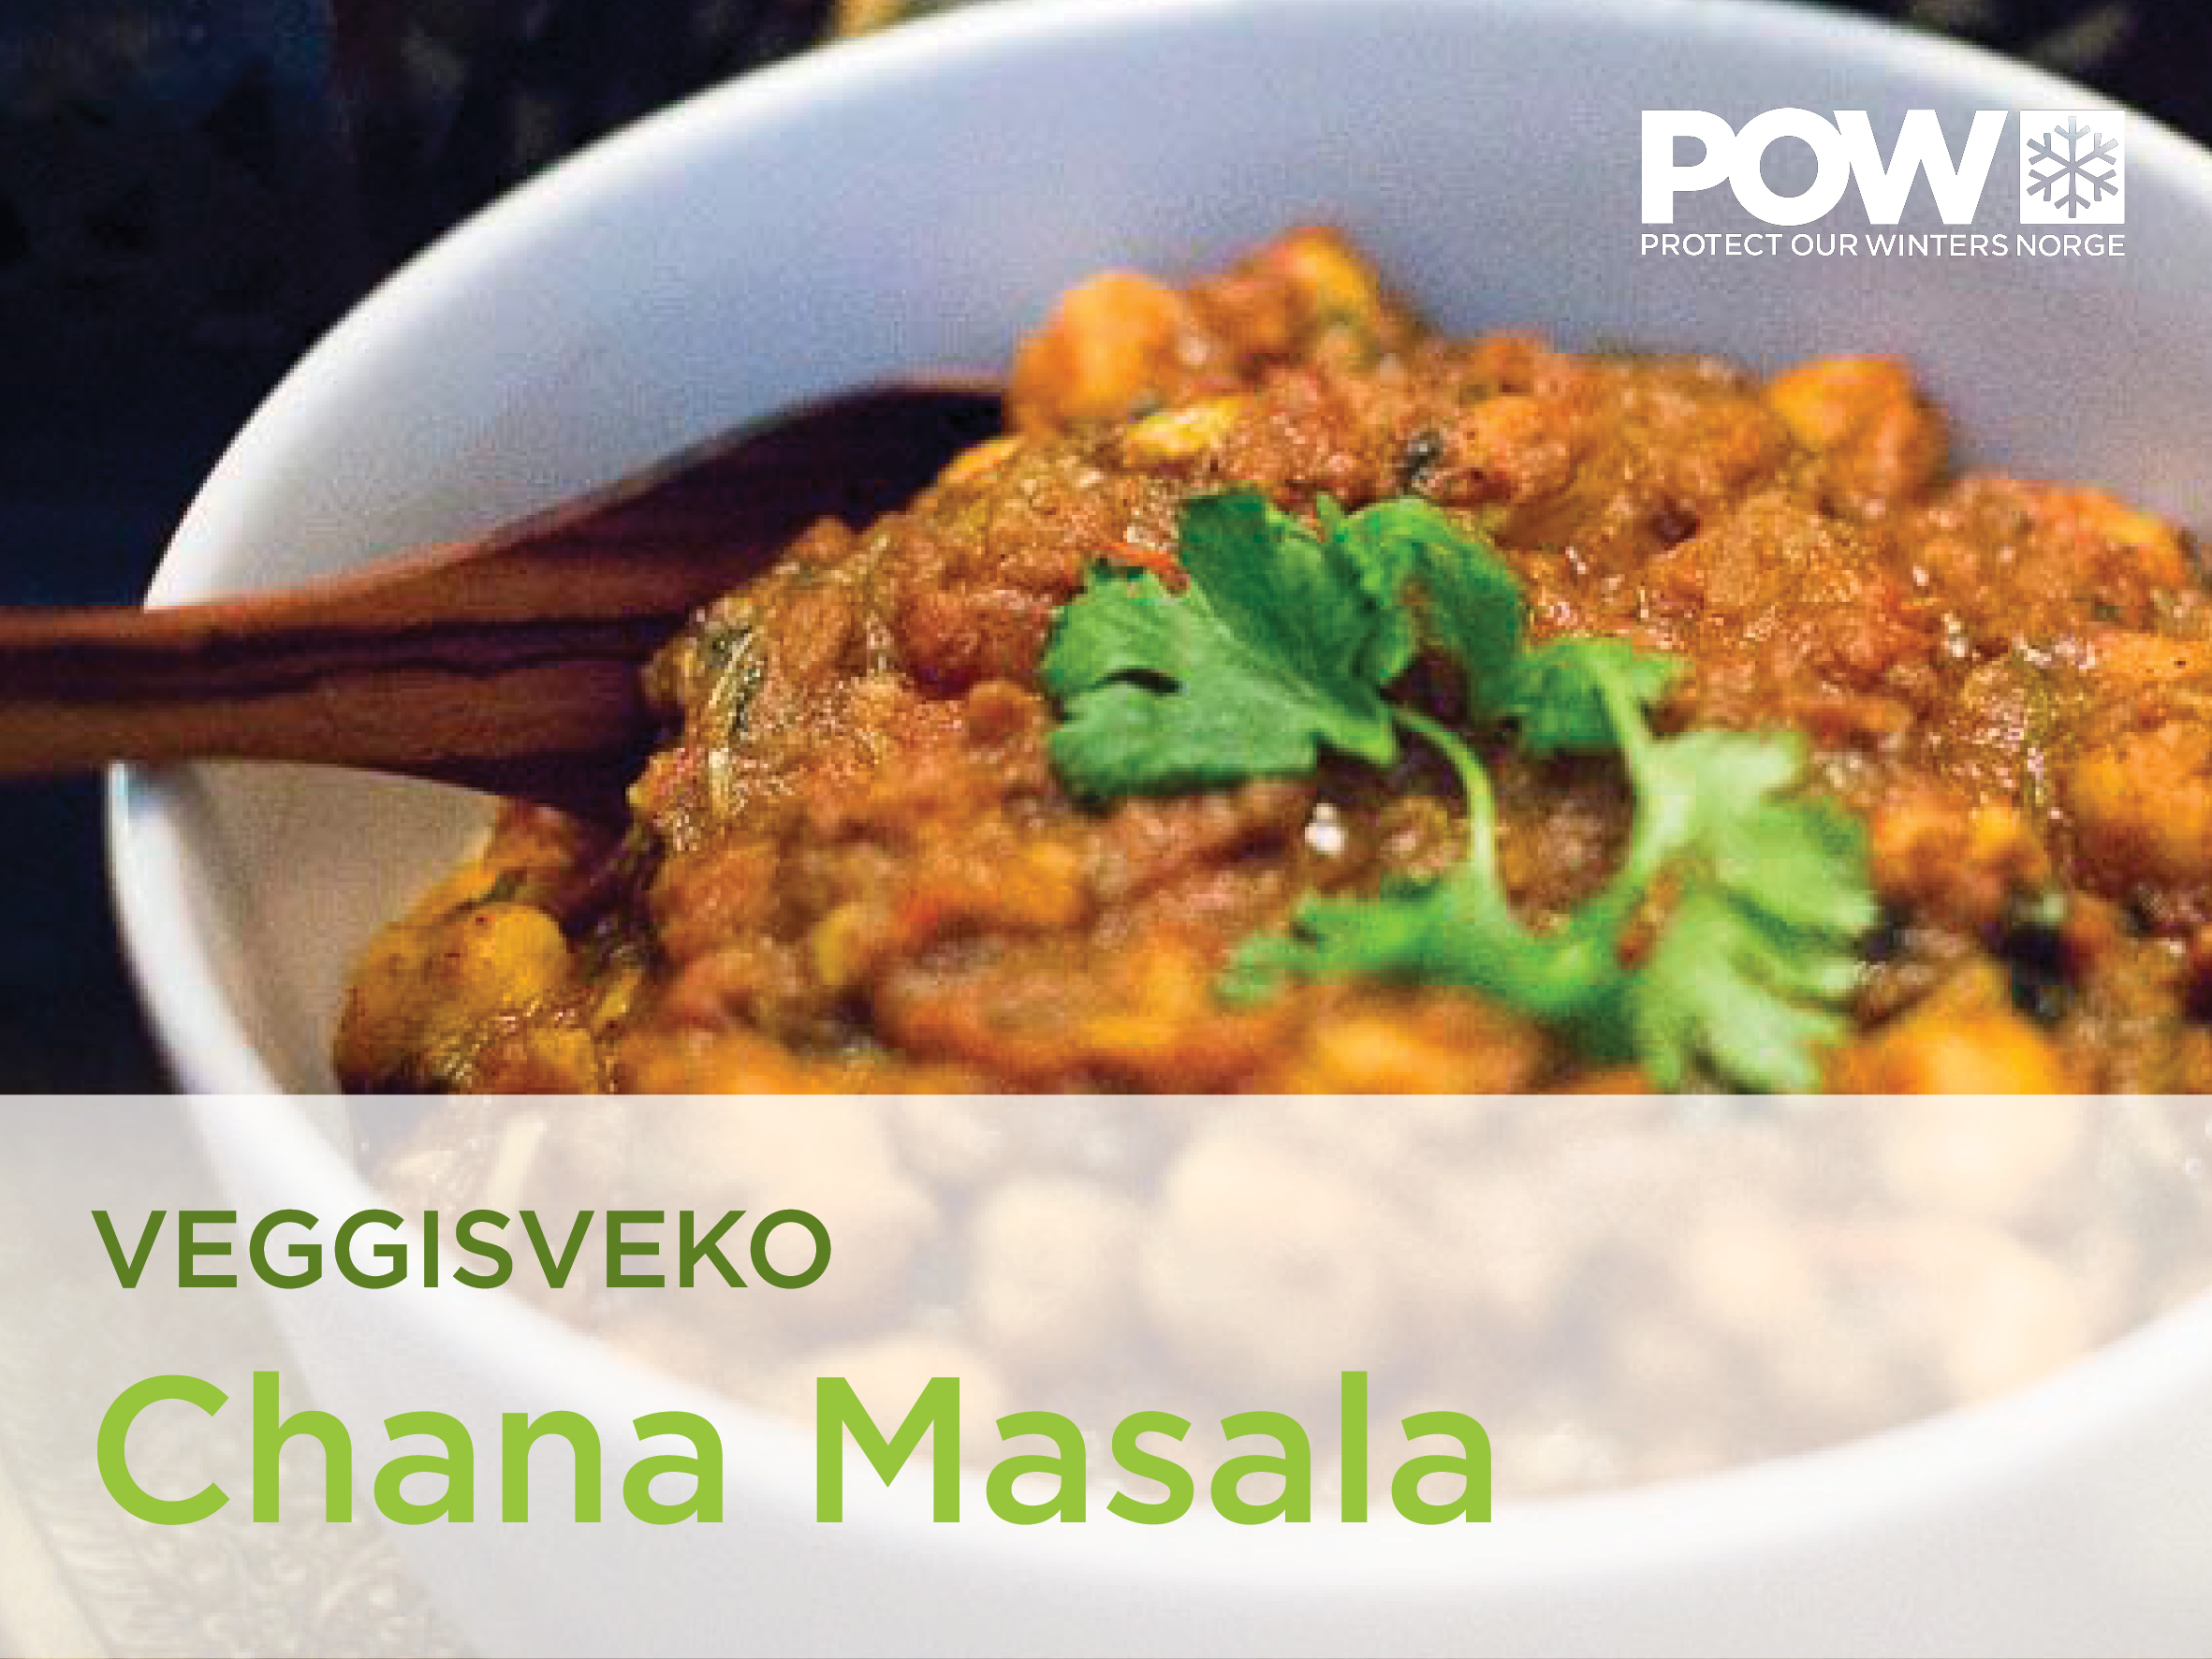 Veggisveko dag #2: Chana Masala